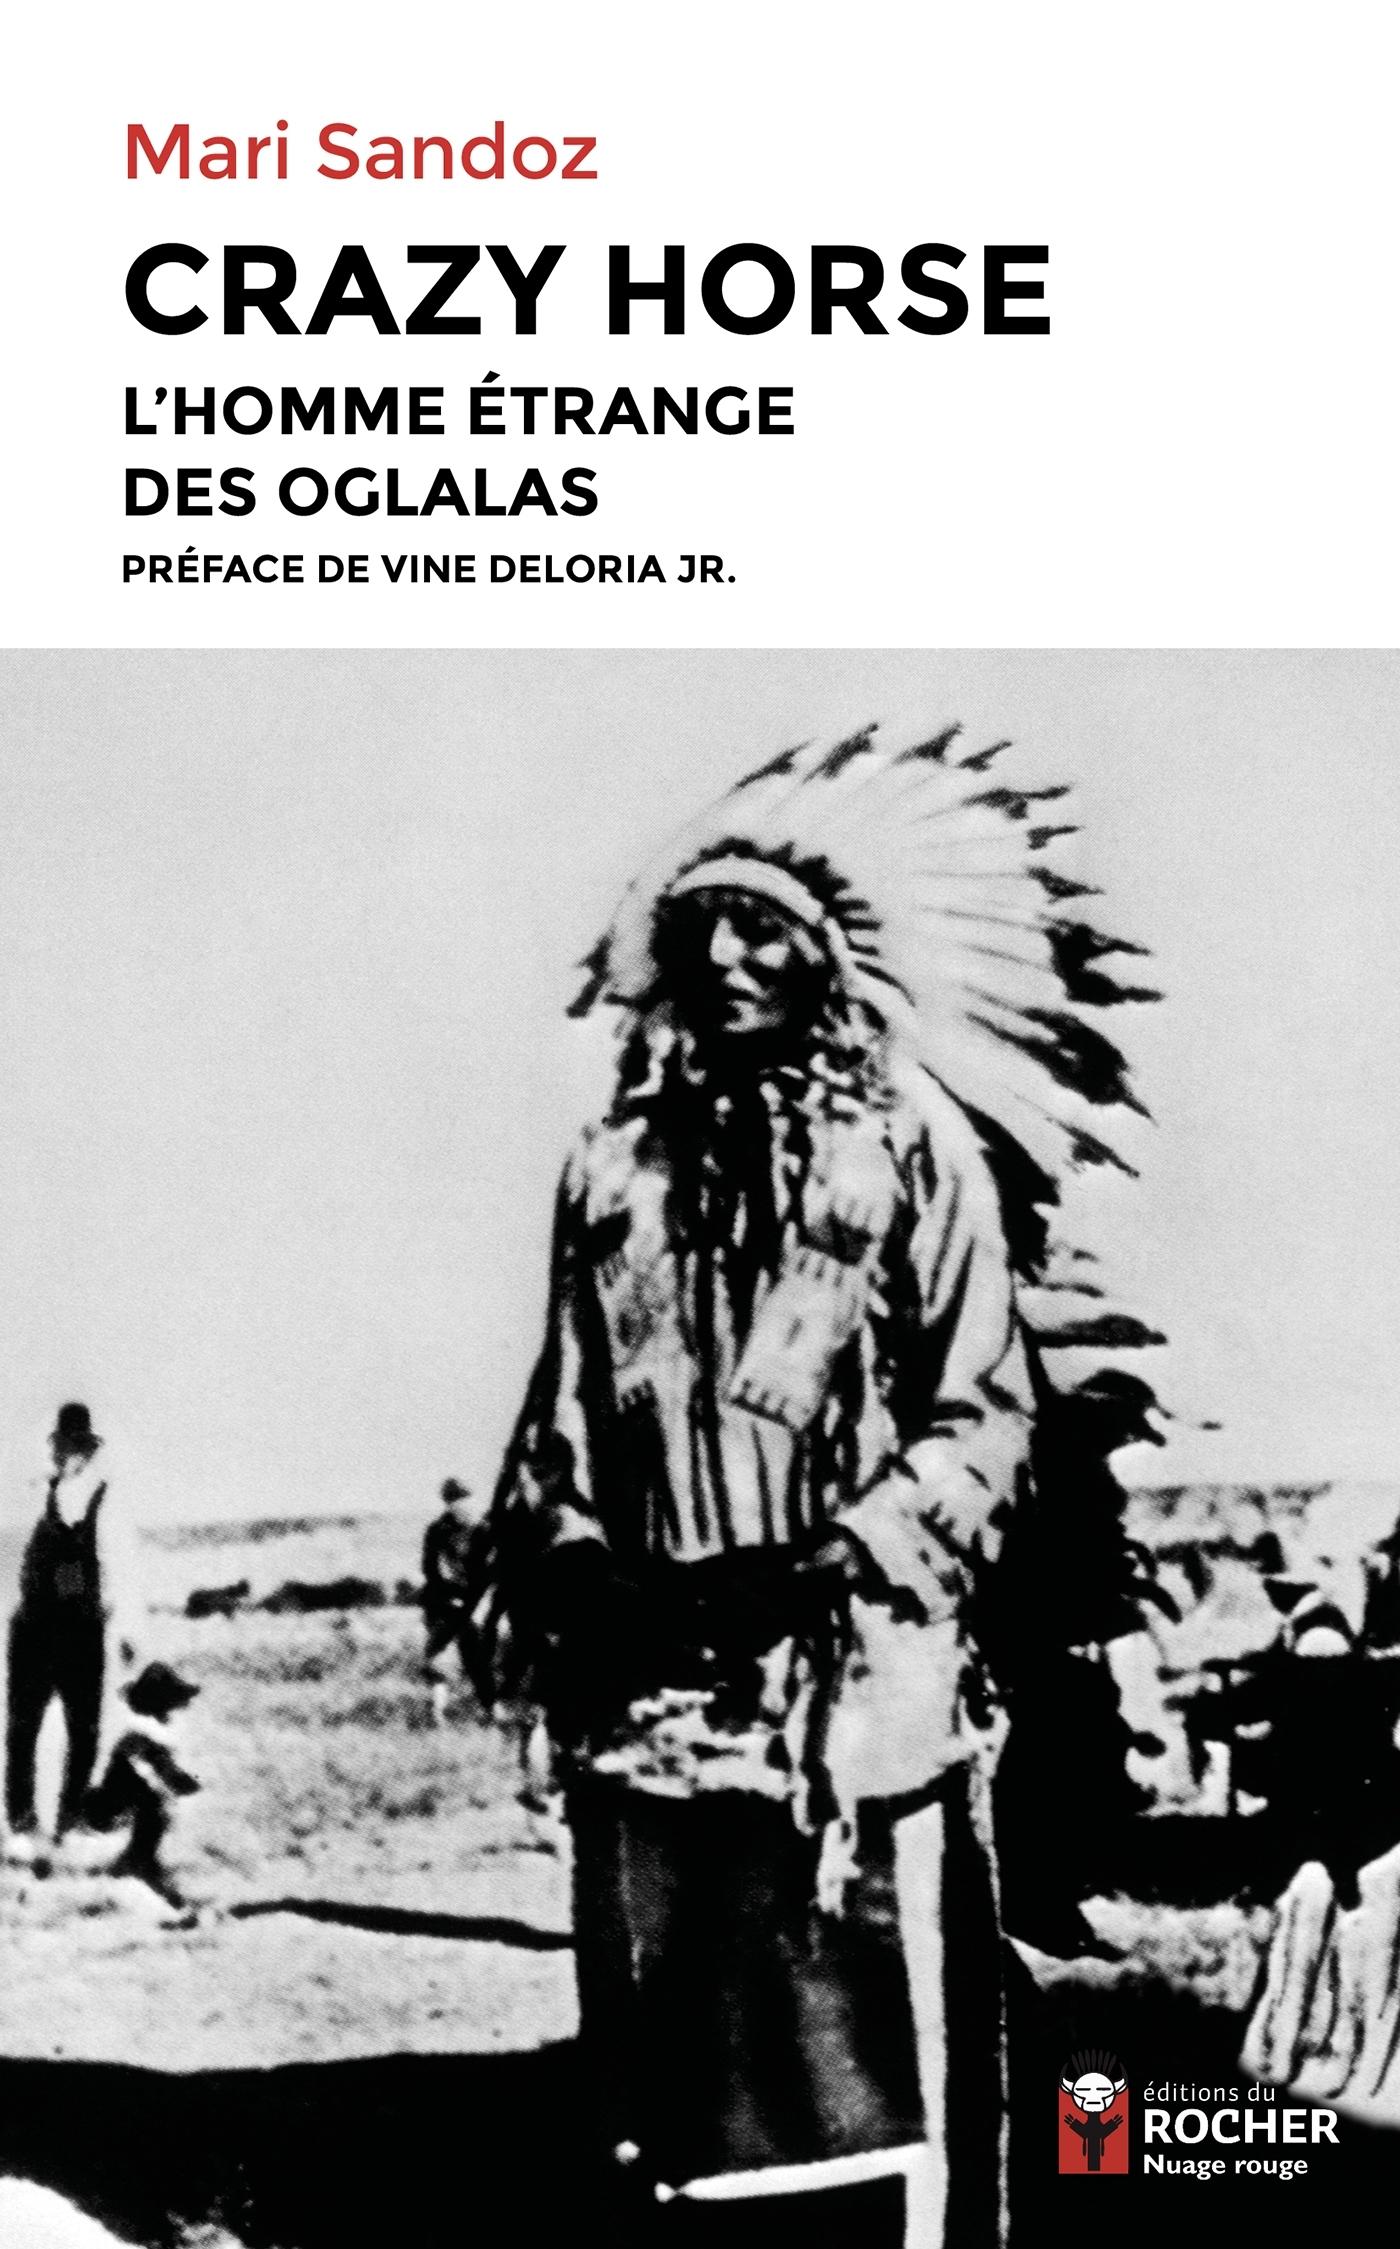 CRAZY HORSE - L'HOMME ETRANGE DES OGLALAS